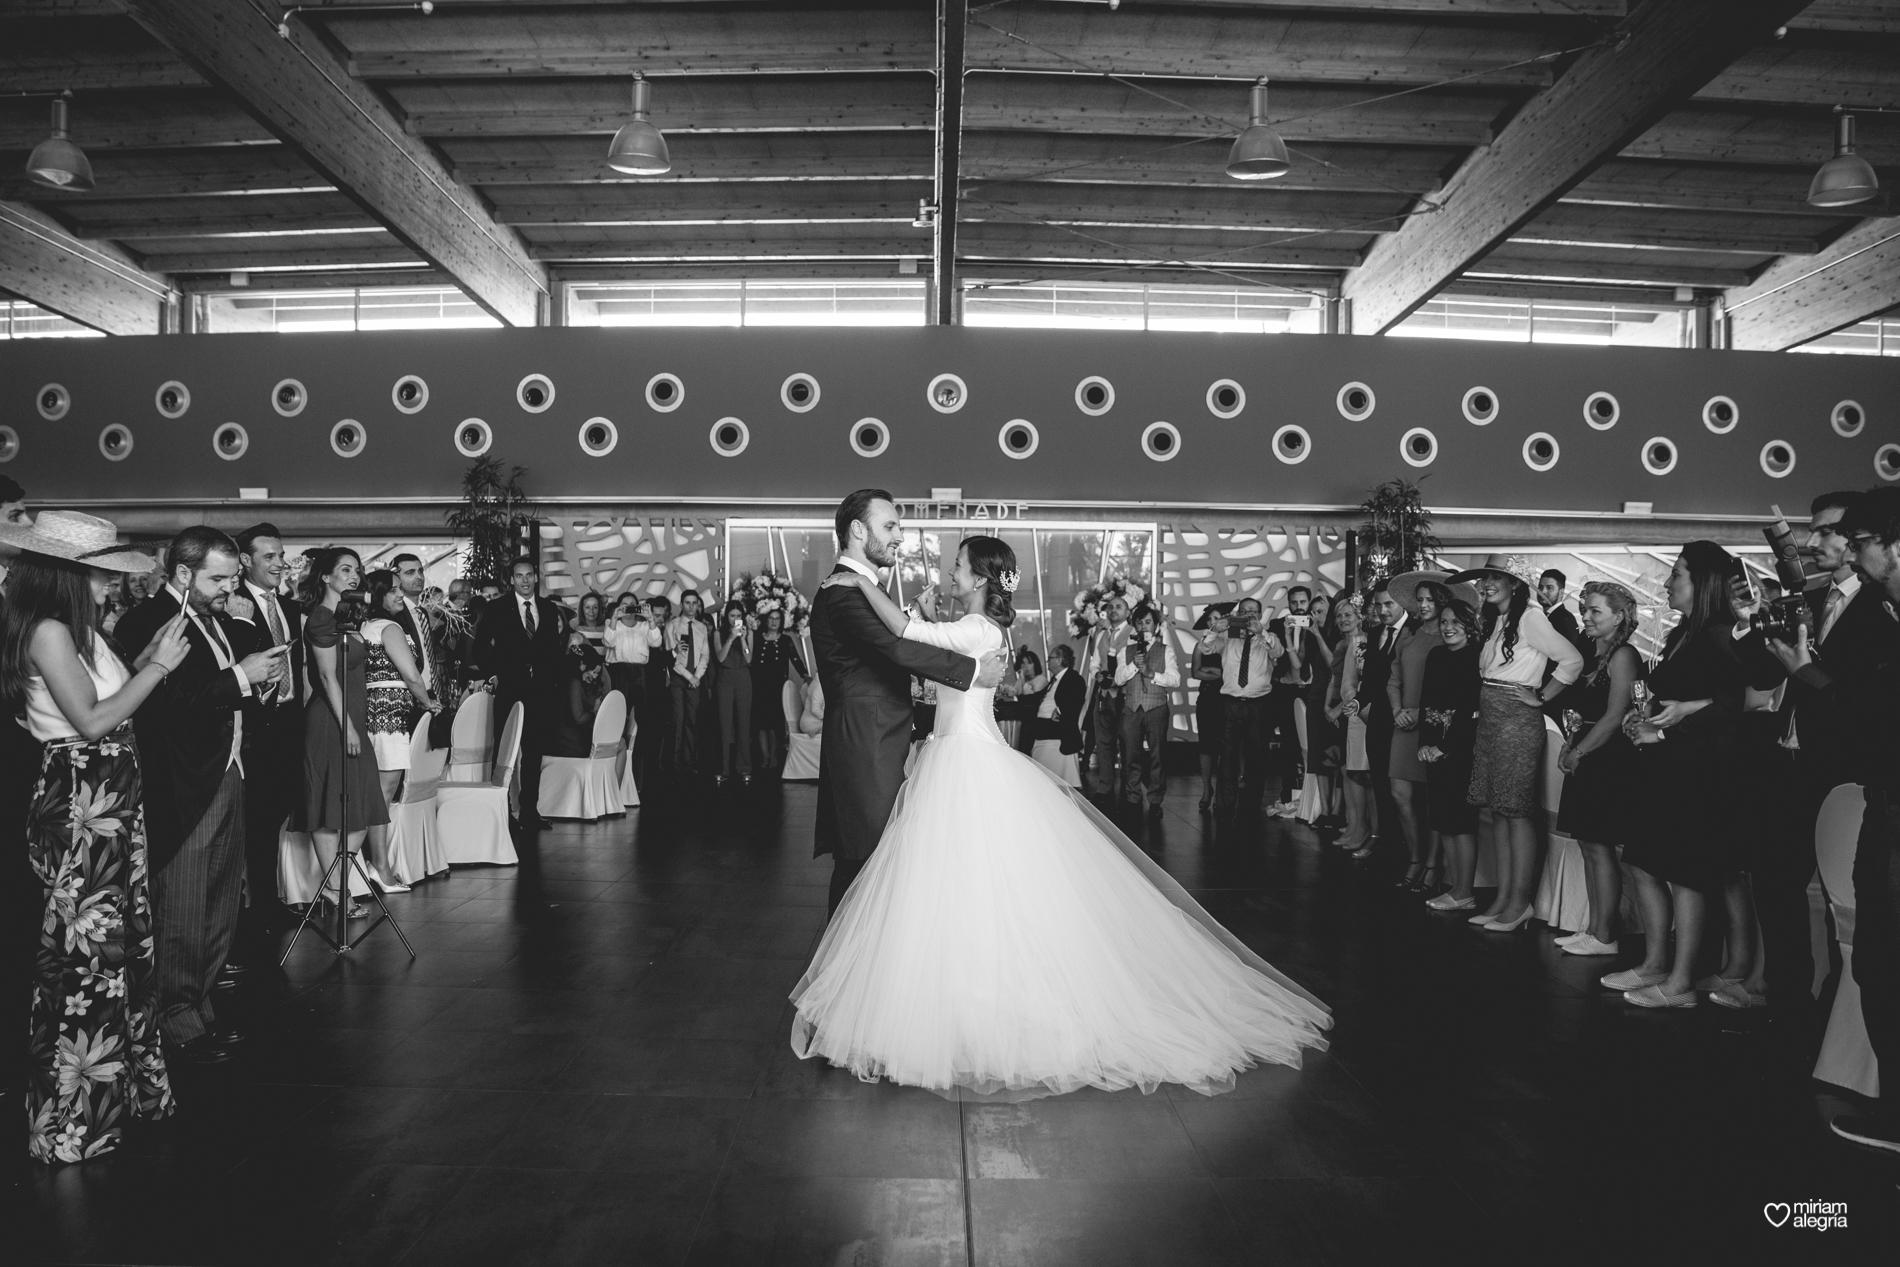 boda-en-la-catedral-de-murcia-miriam-alegria-fotografos-boda-murcia-74